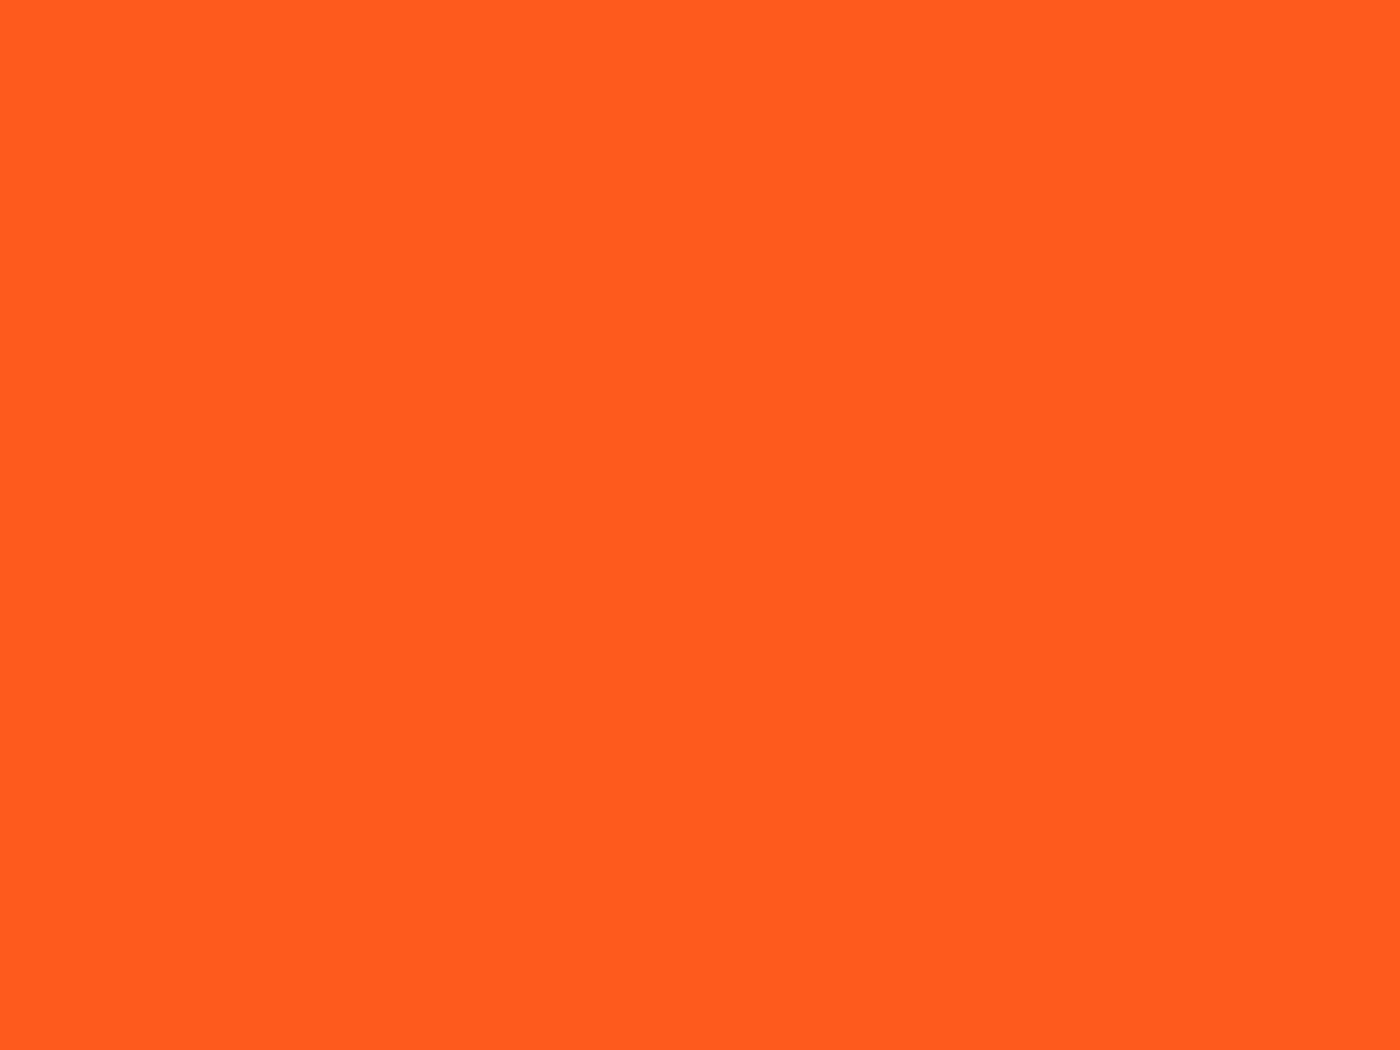 1400x1050 Giants Orange Solid Color Background